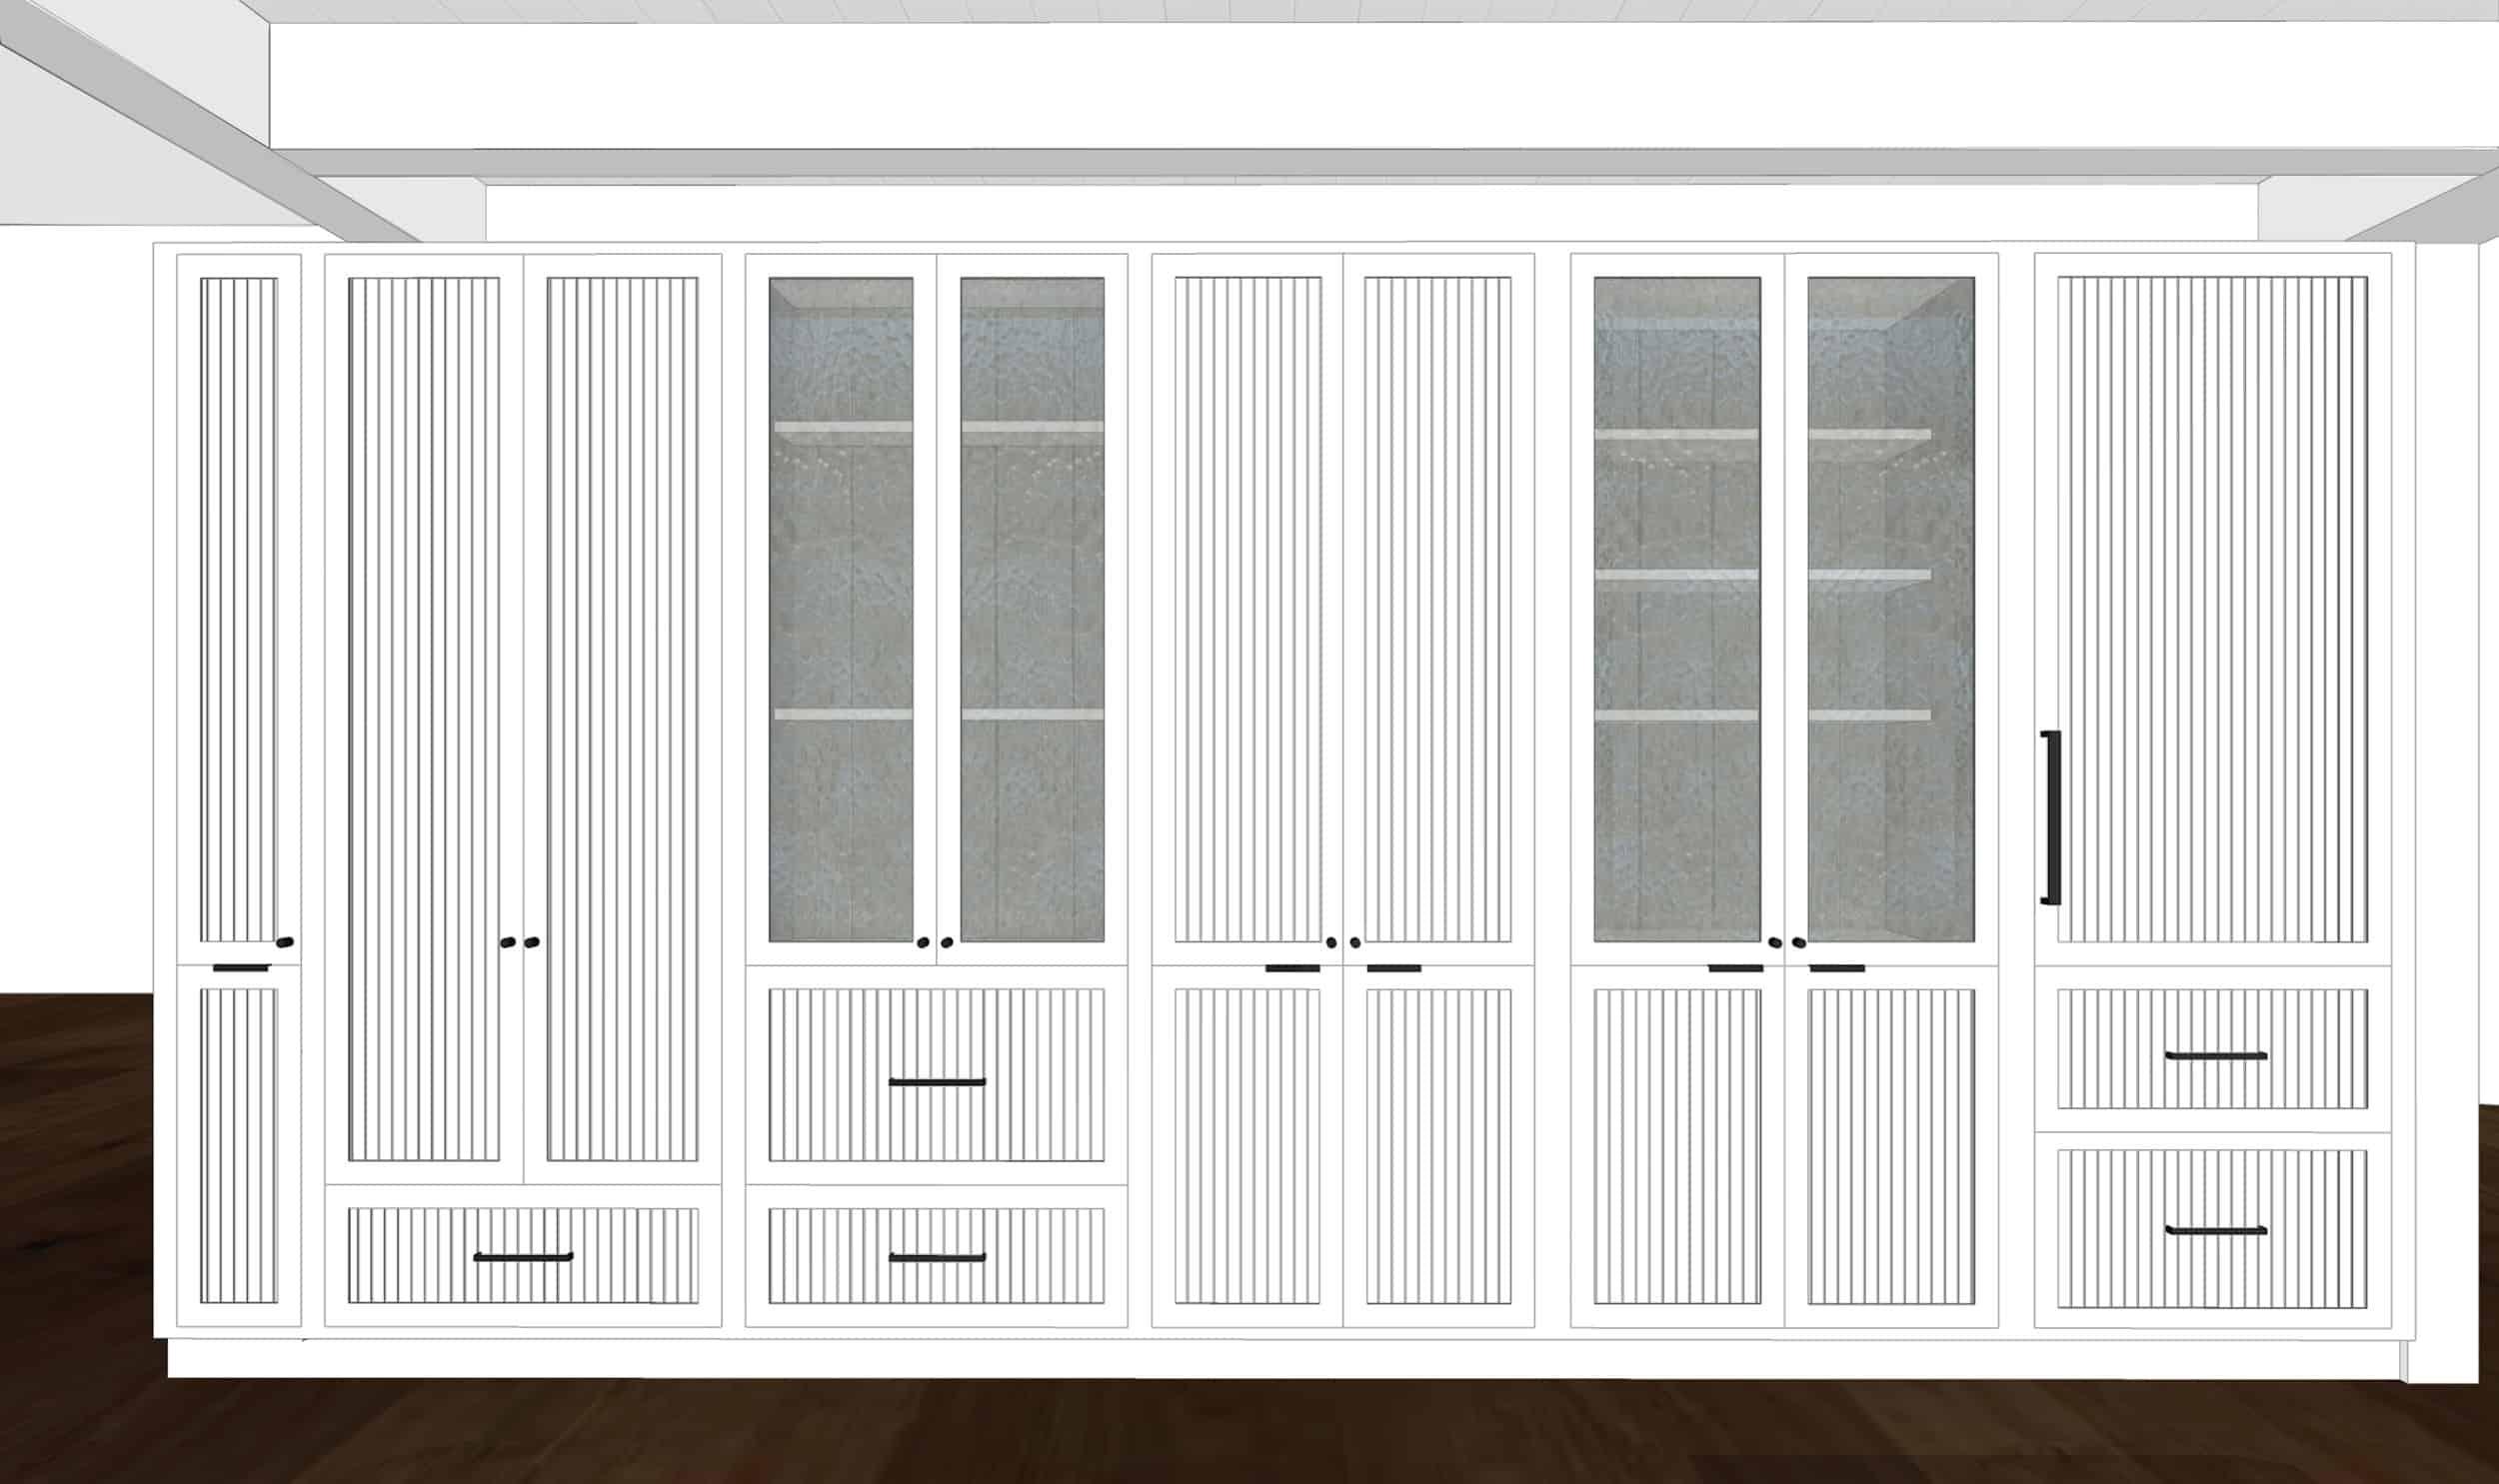 Emily Henderson Mountain Fixer Upper I Design You Decide Kitchen Render 08 Fnl